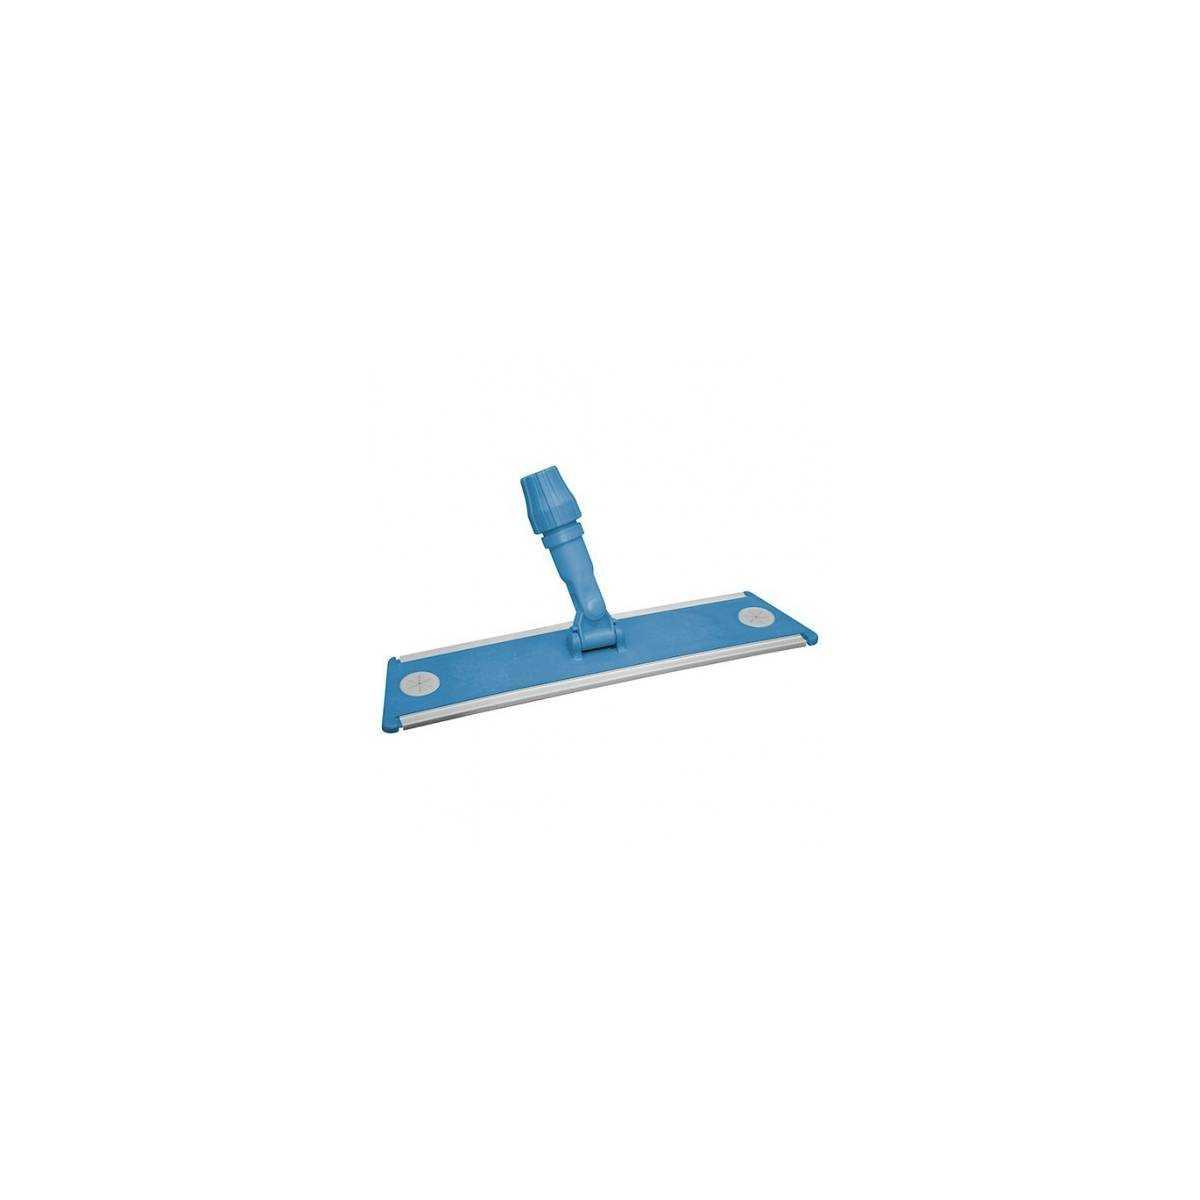 Основа Velcro 40см (Цвет голубой) 0B000887 TTS